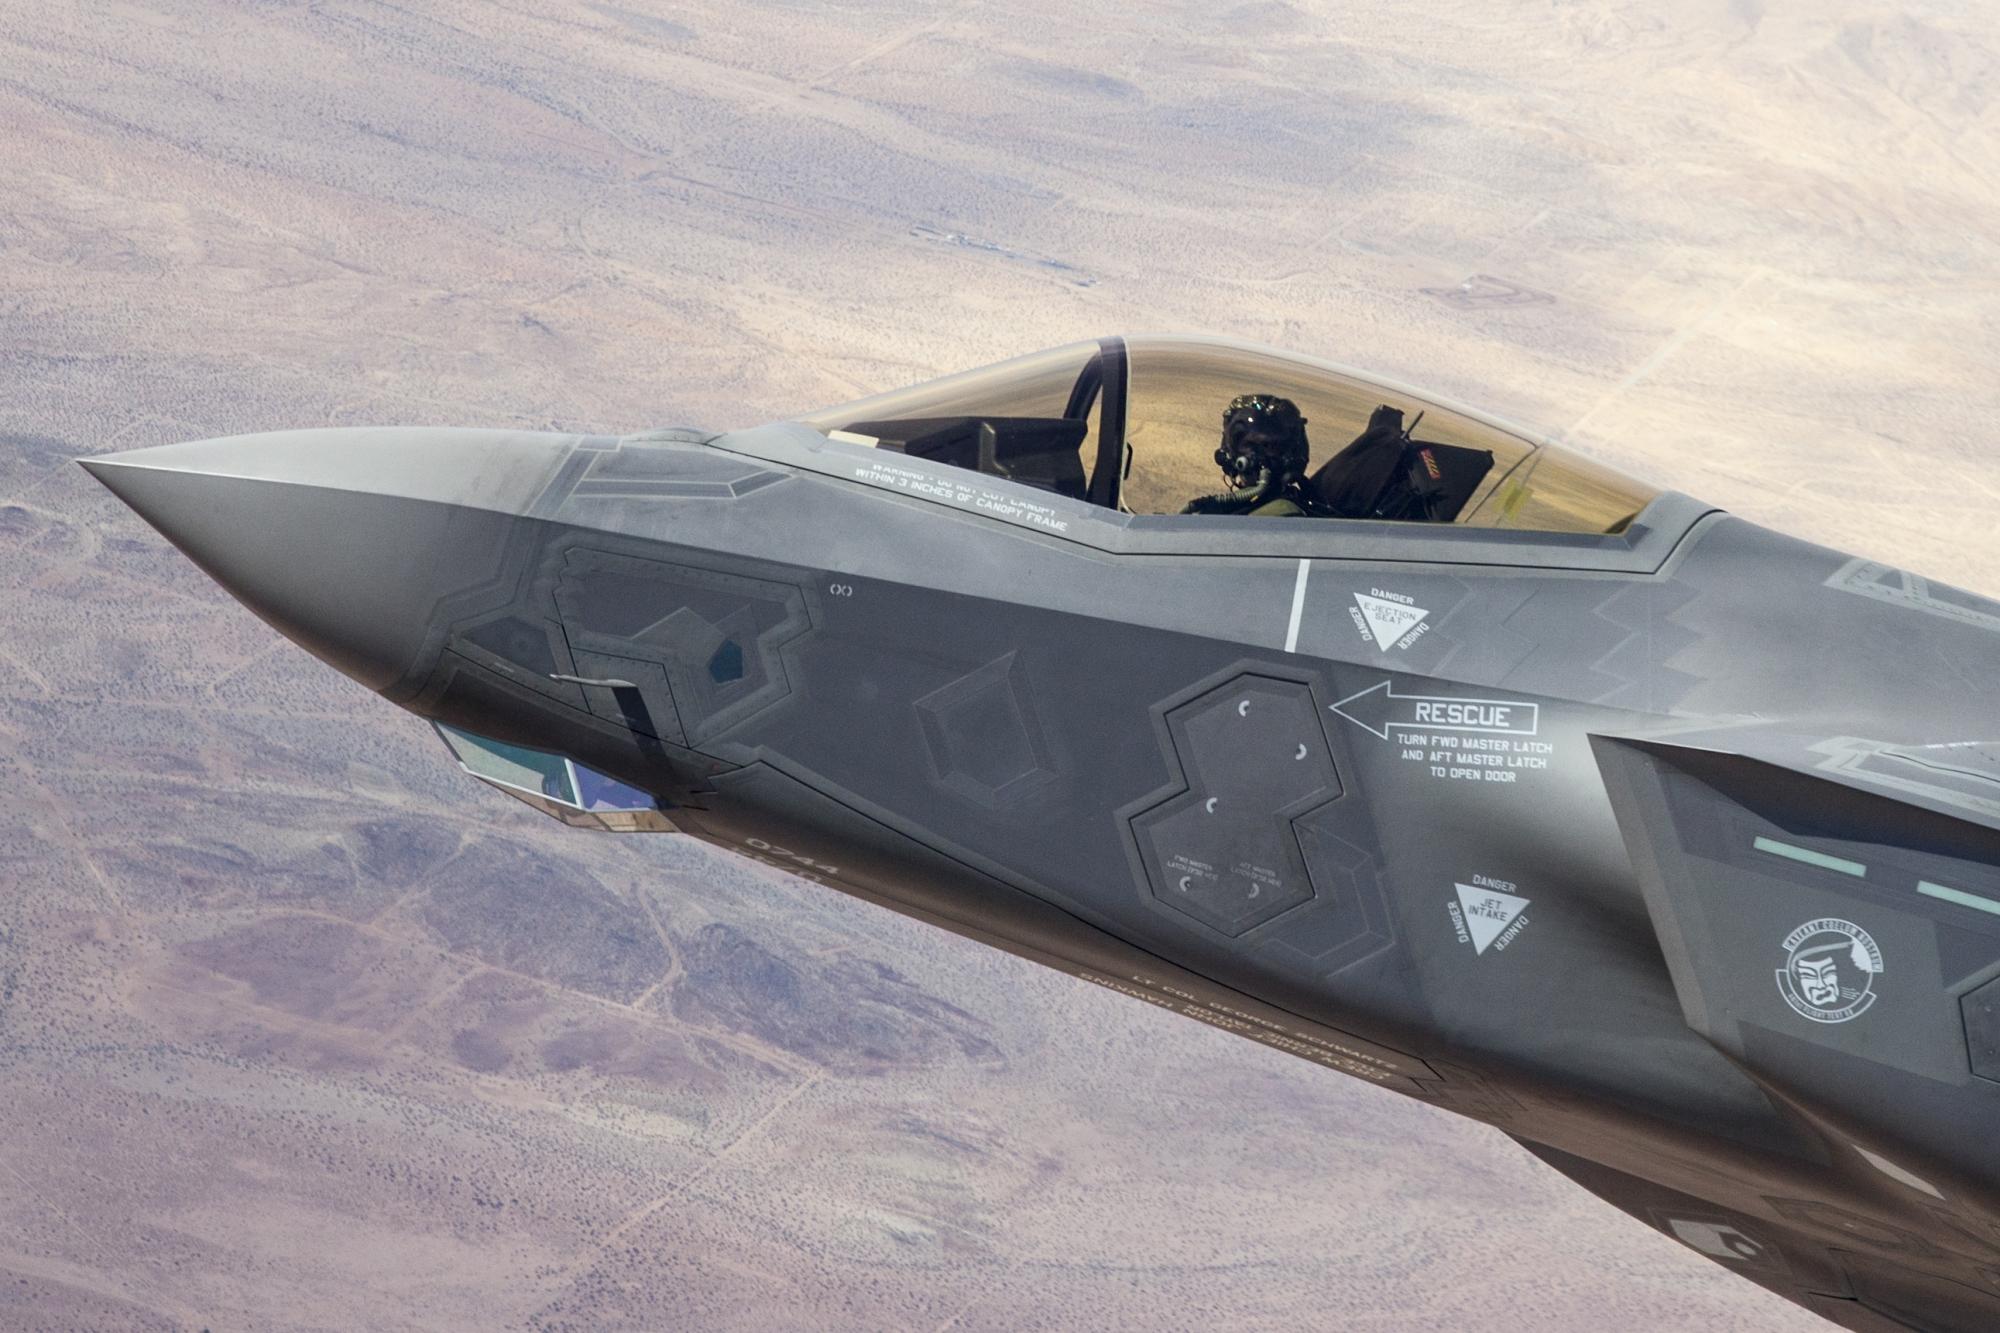 (fot. materiały prasowe Lockheeda Martina)